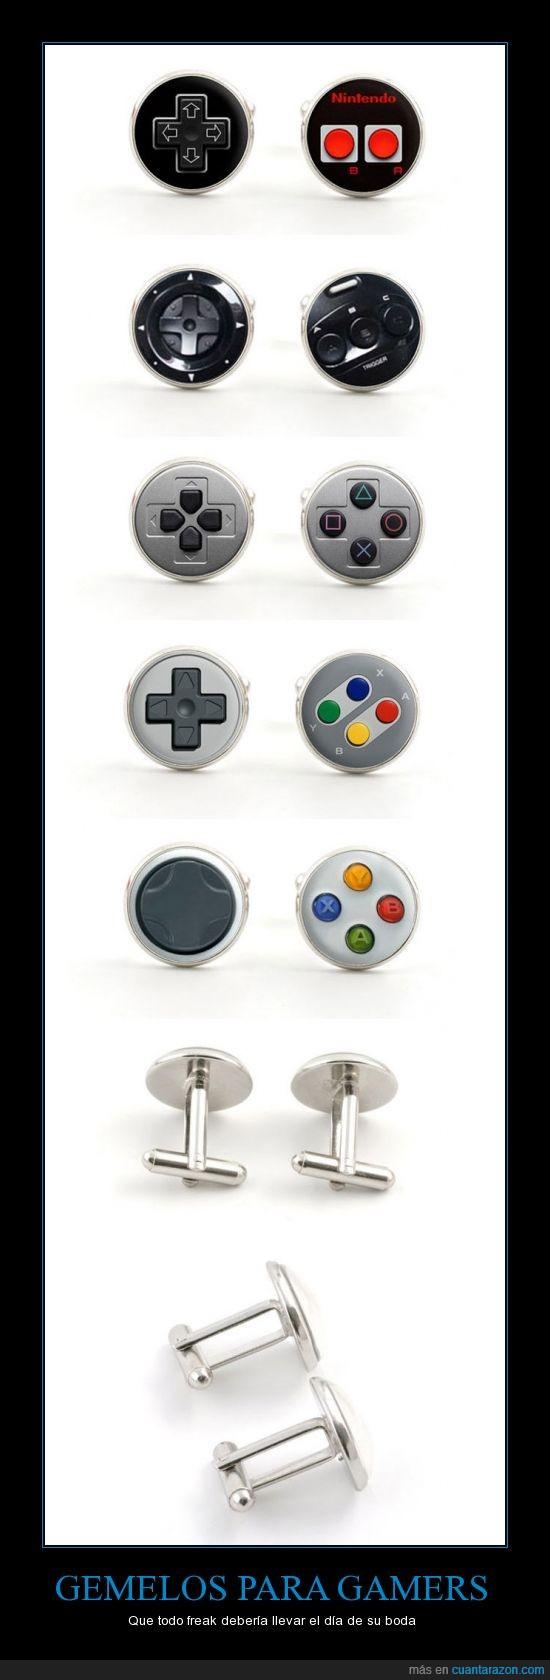 consola,controlador,gemelos,nintendo,psx,xbox